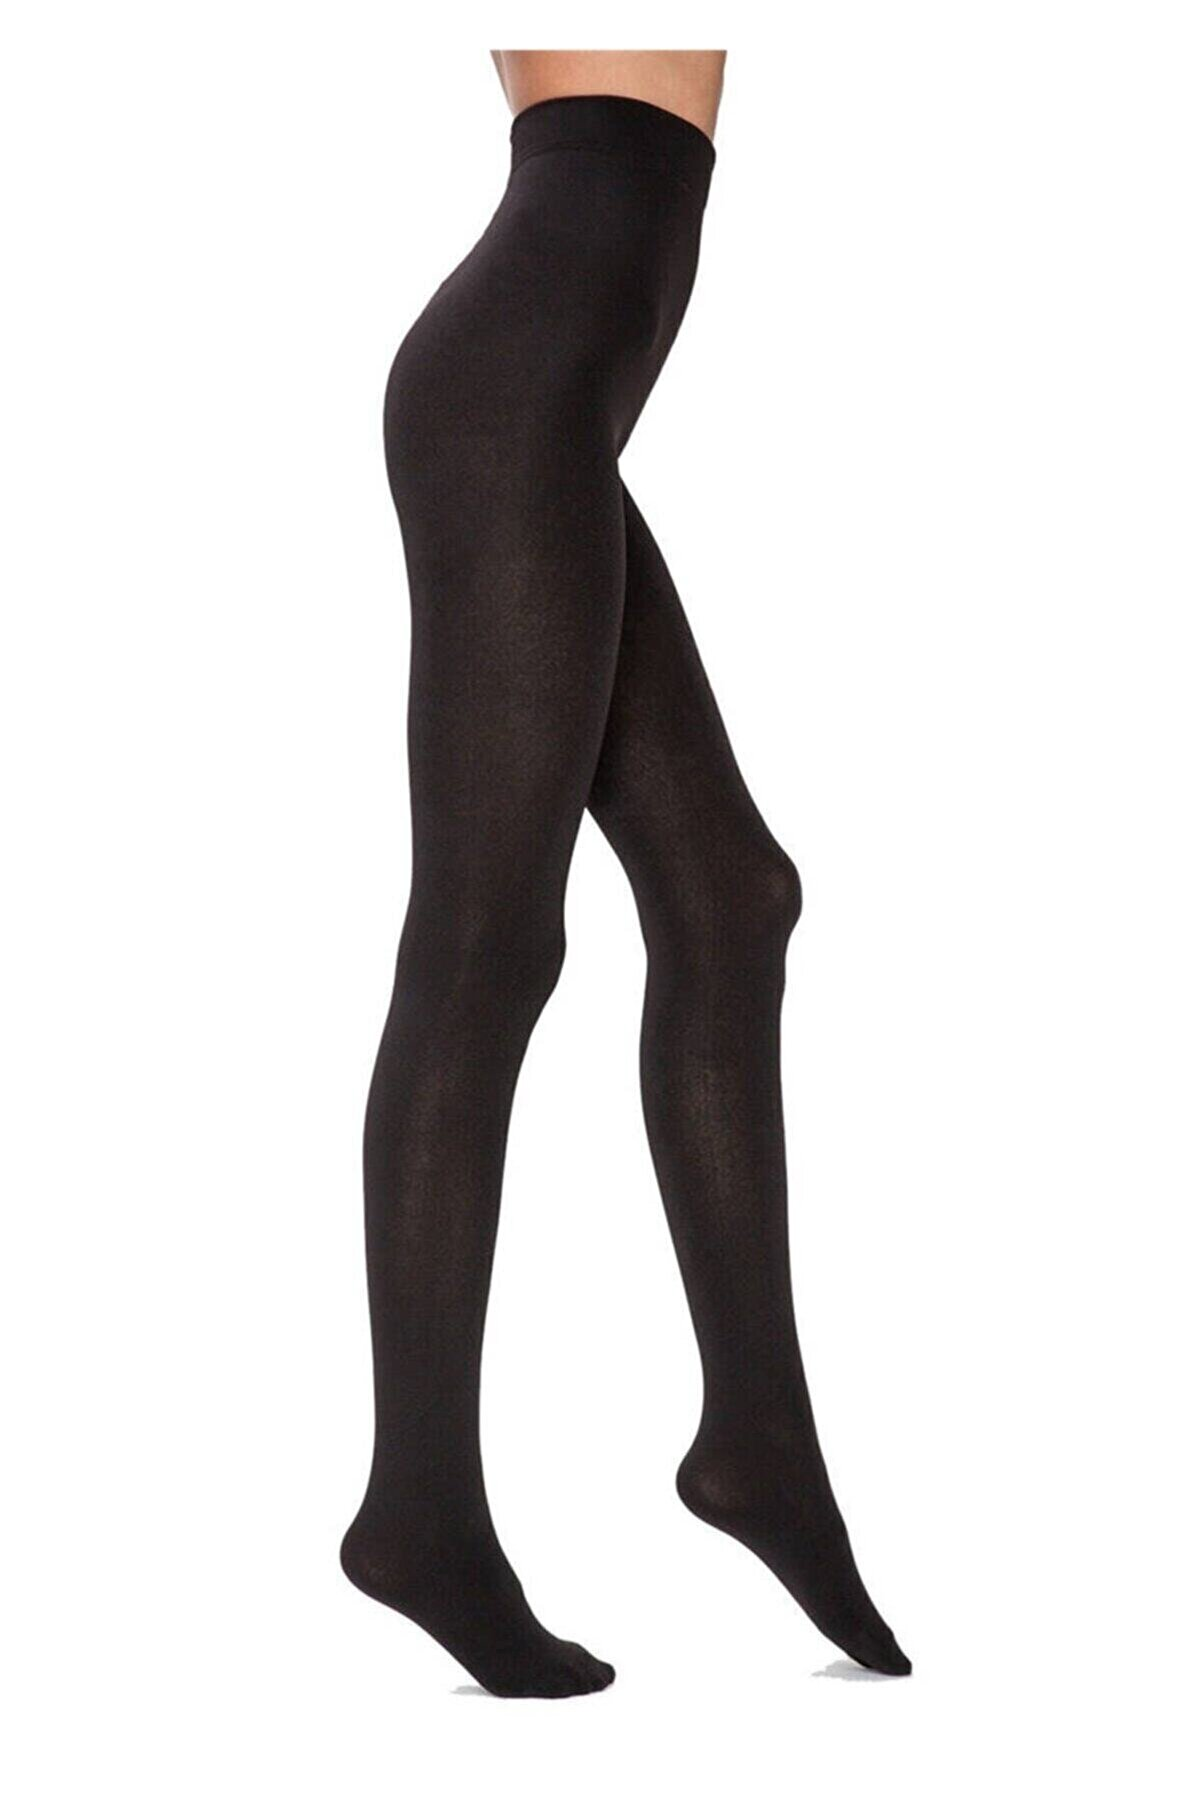 Penti Thermal Külotlu Çorap | Siyah